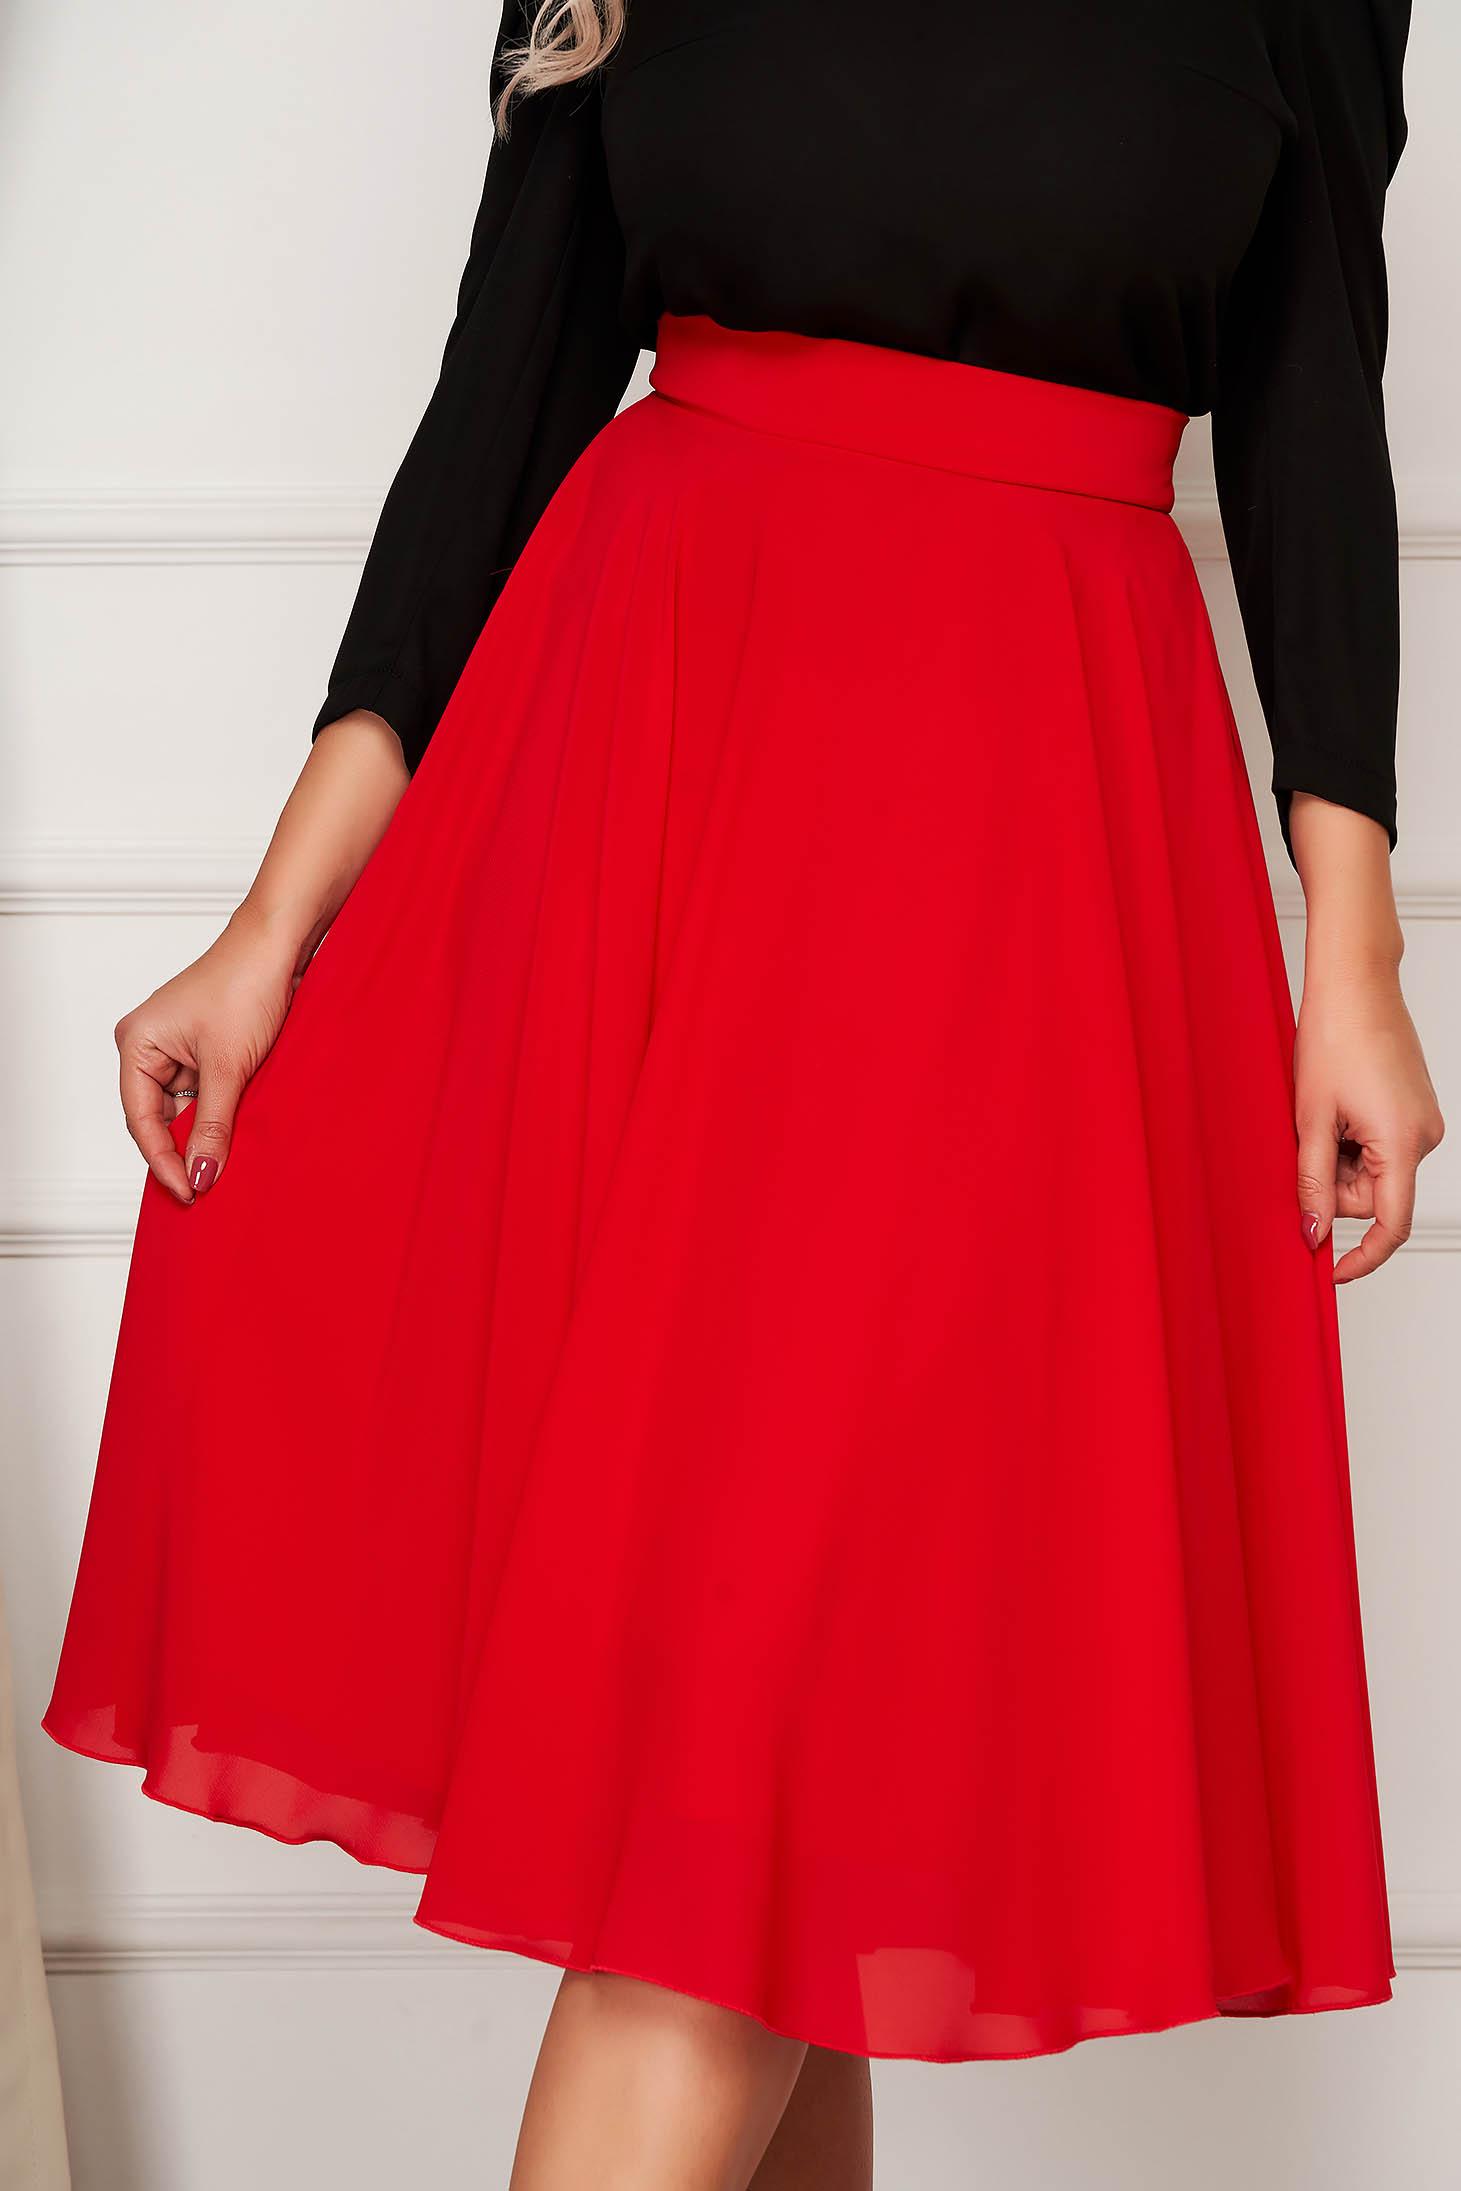 StarShinerS red skirt elegant midi cloche from veil fabric high waisted